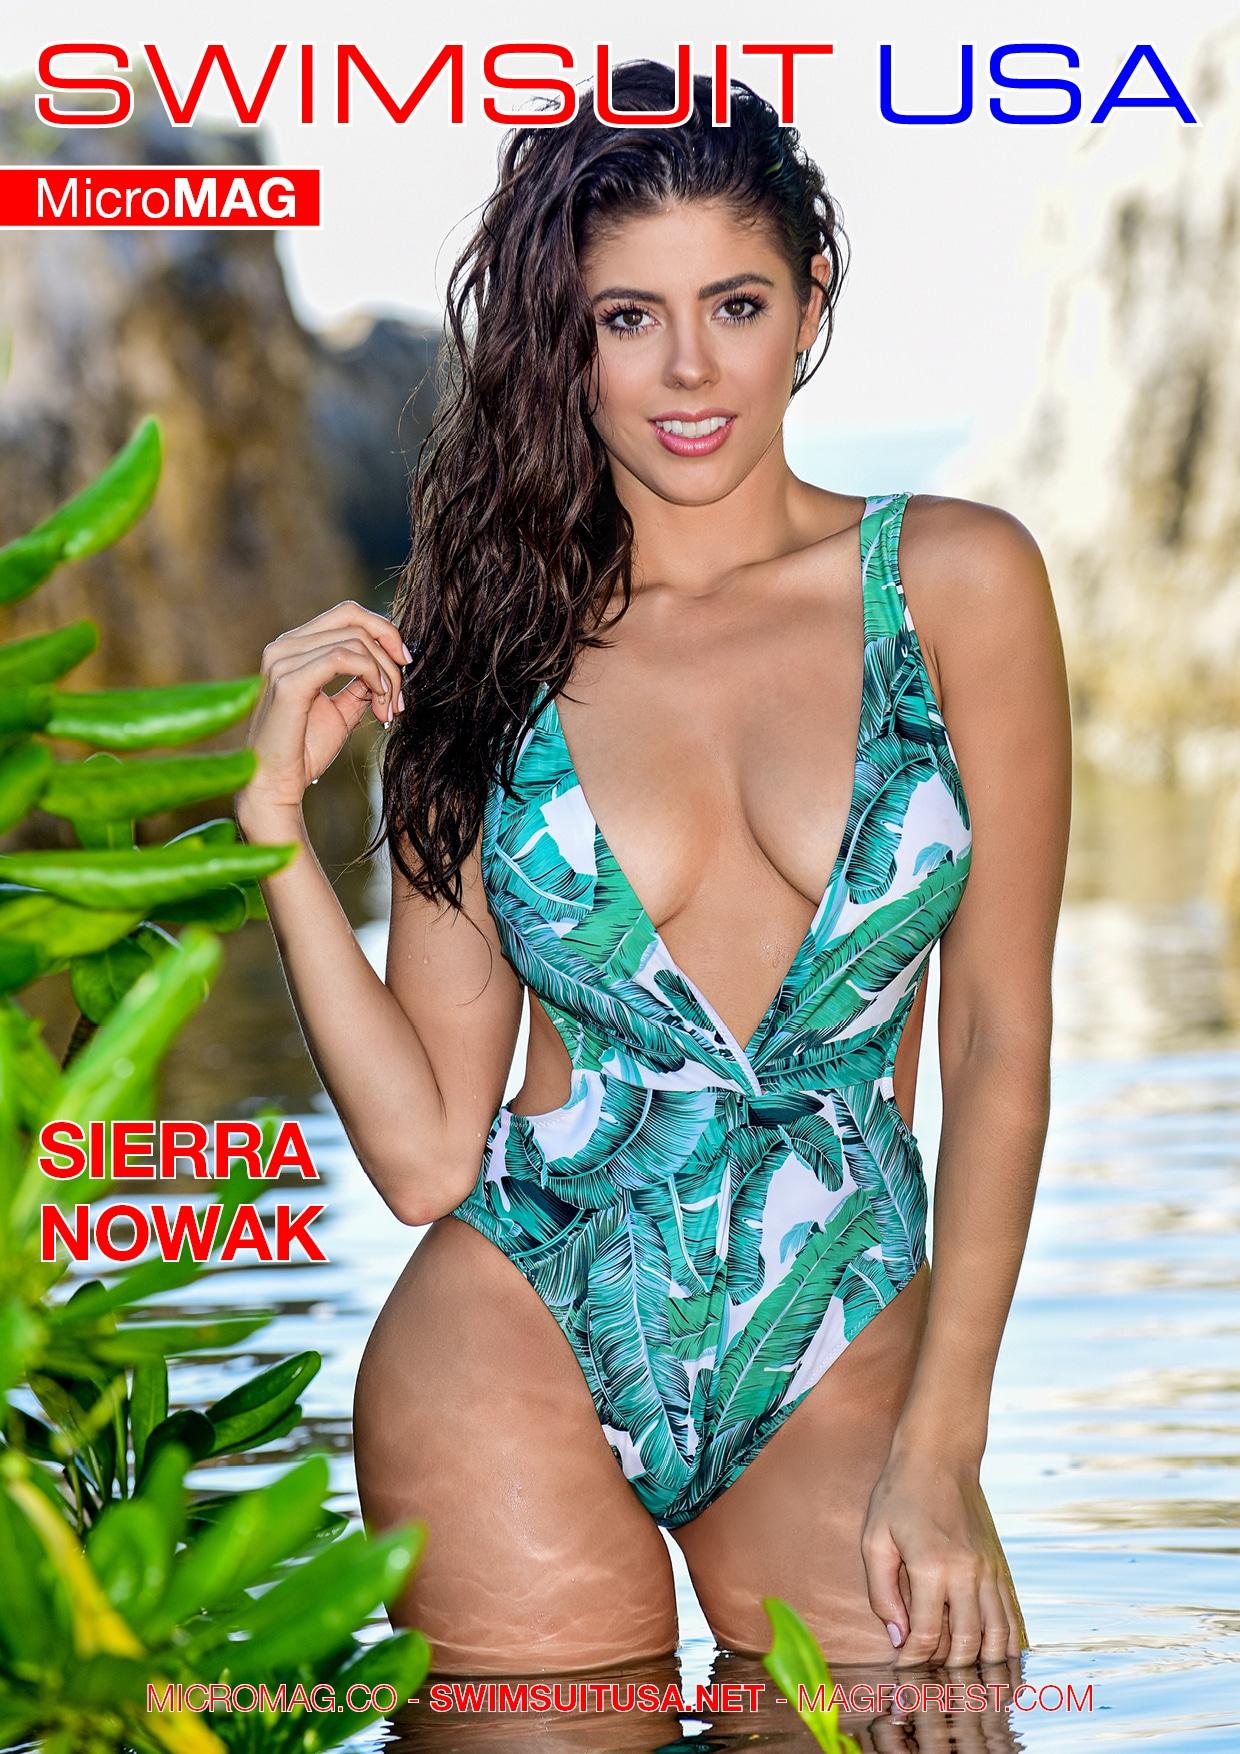 Swimsuit USA MicroMAG - Sierra Nowak - Issue 4